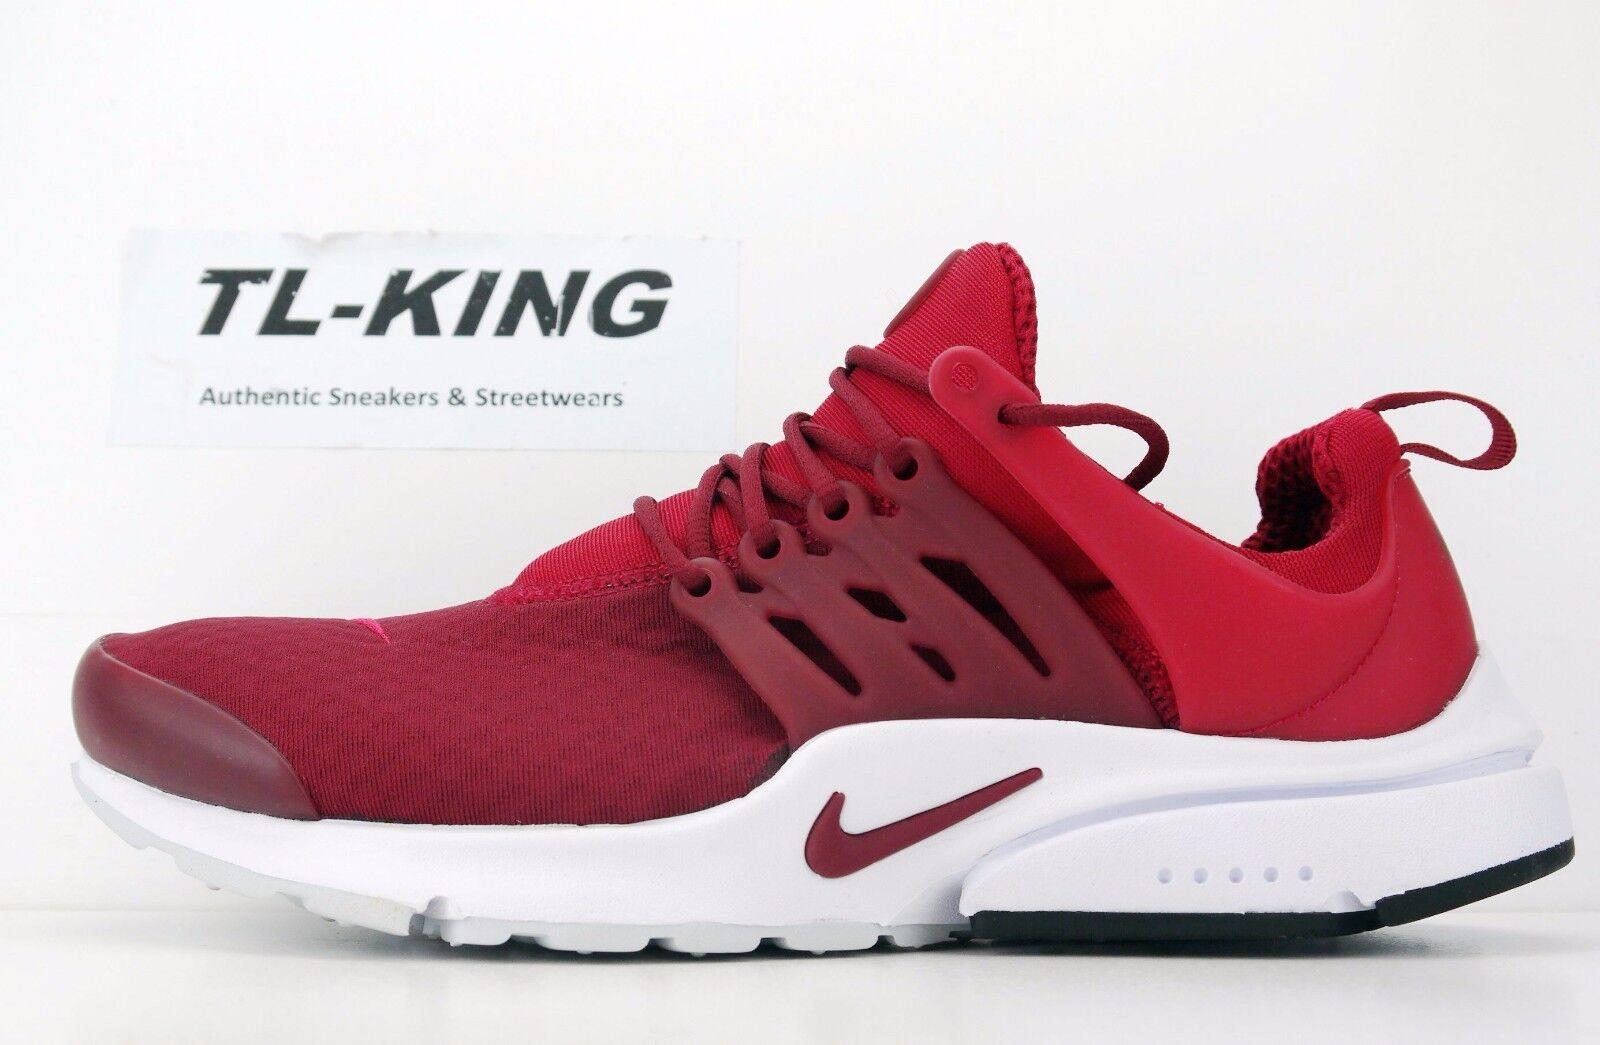 Nike Air Presto Essential Mens 848187-604 Gym Team Red Running Shoes ... e651b6c81